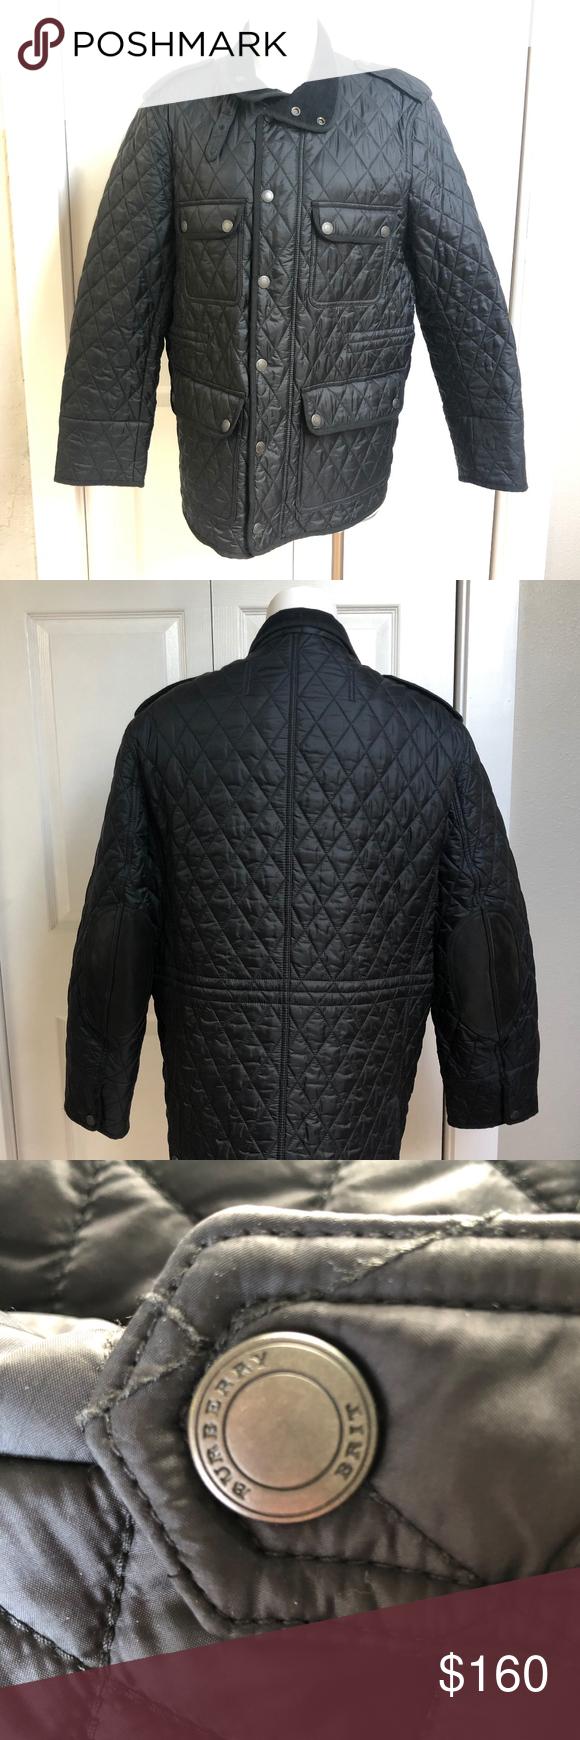 Men S Burberry Brit Diamond Quilted Jacket Quilted Jacket Burberry Brit Burberry Brit Jacket